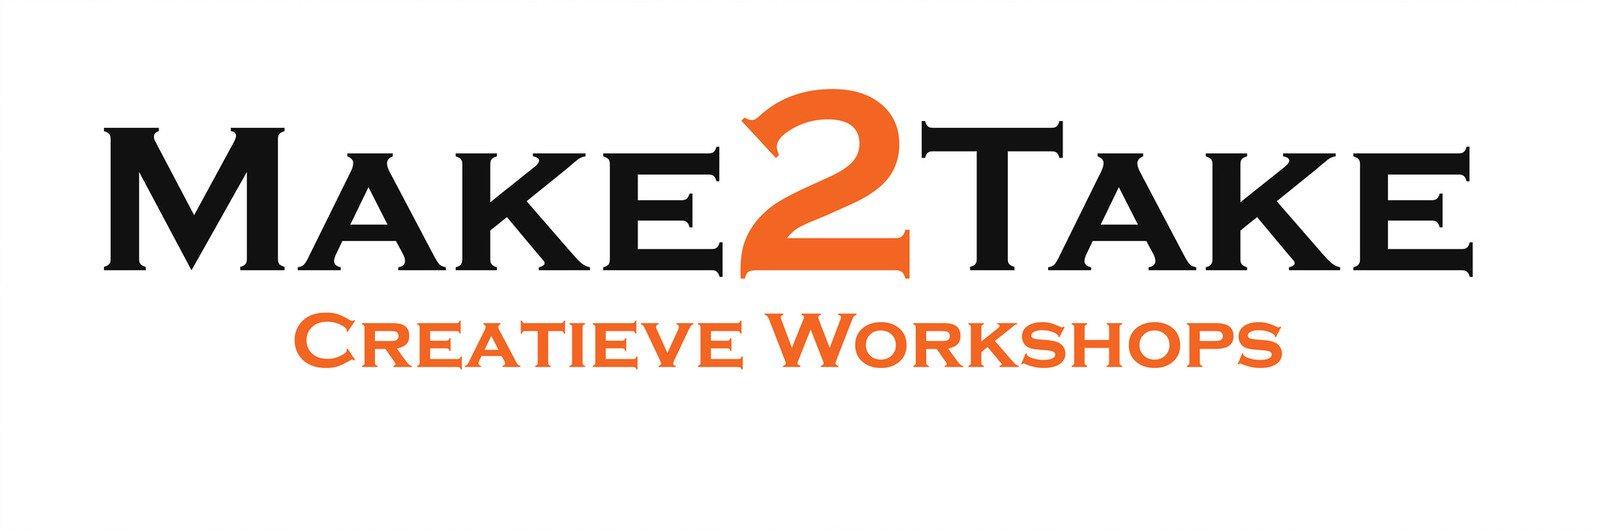 Make2Take